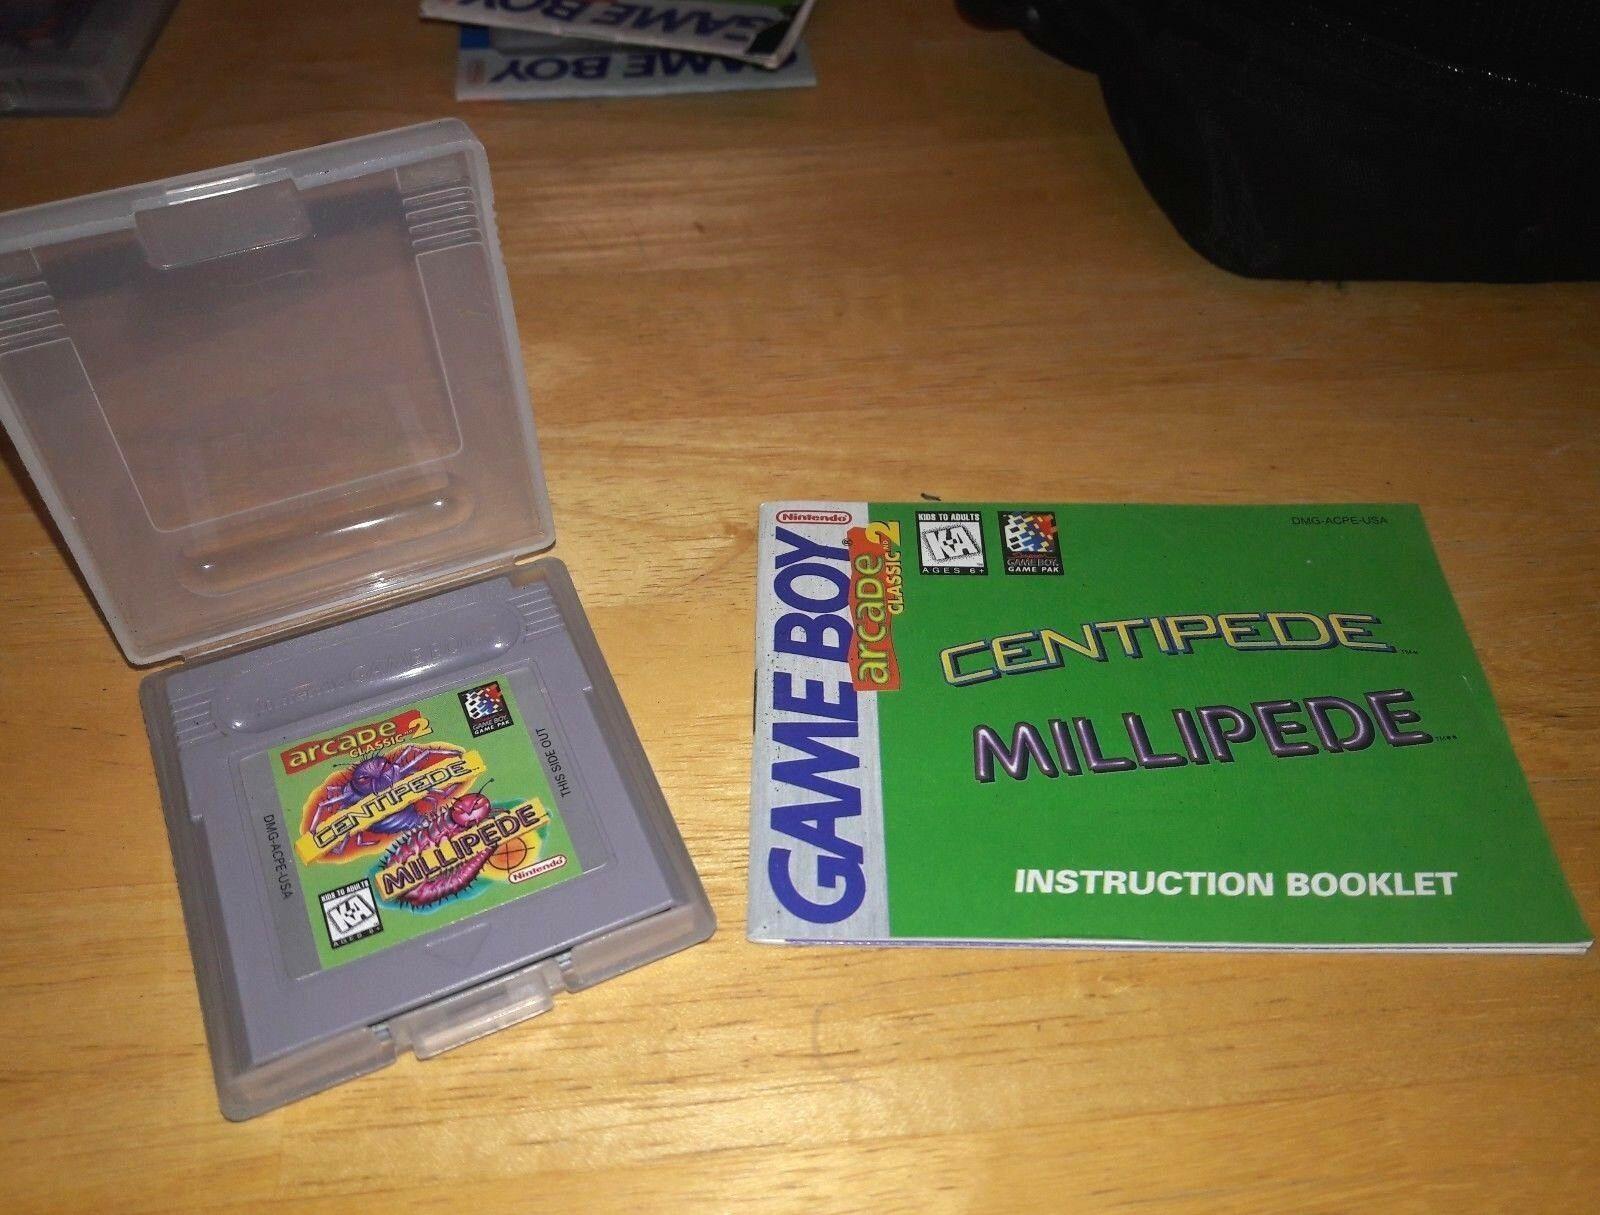 Centipede / Millipede Arcade Classic 2 Nintendo Game Boy Instruction Book Tested